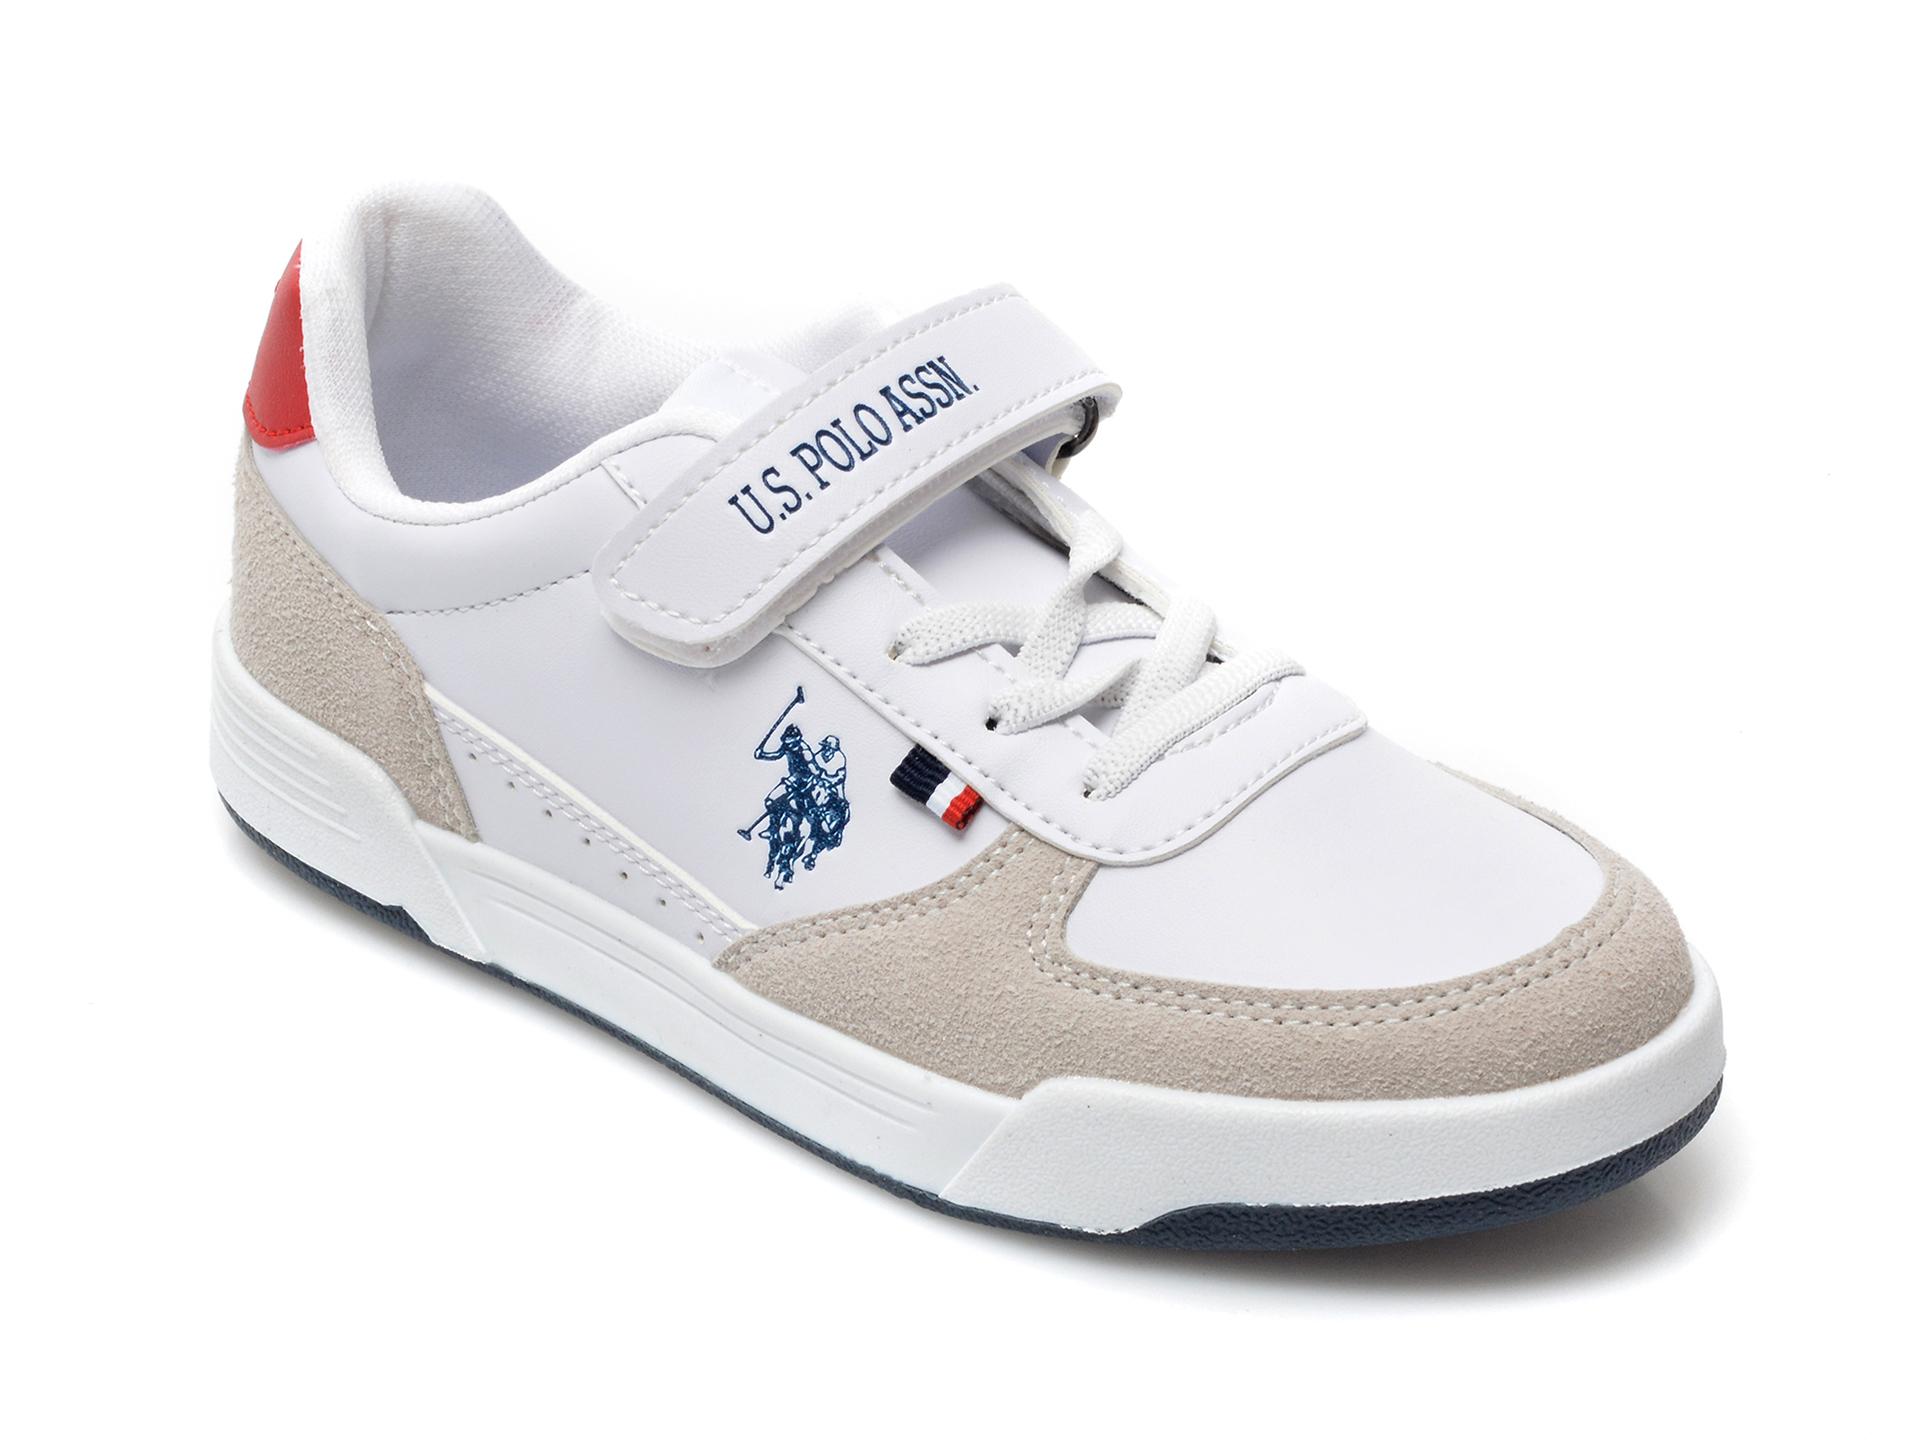 Pantofi sport US POLO ASSN albi, CLINEJR, din piele ecologica